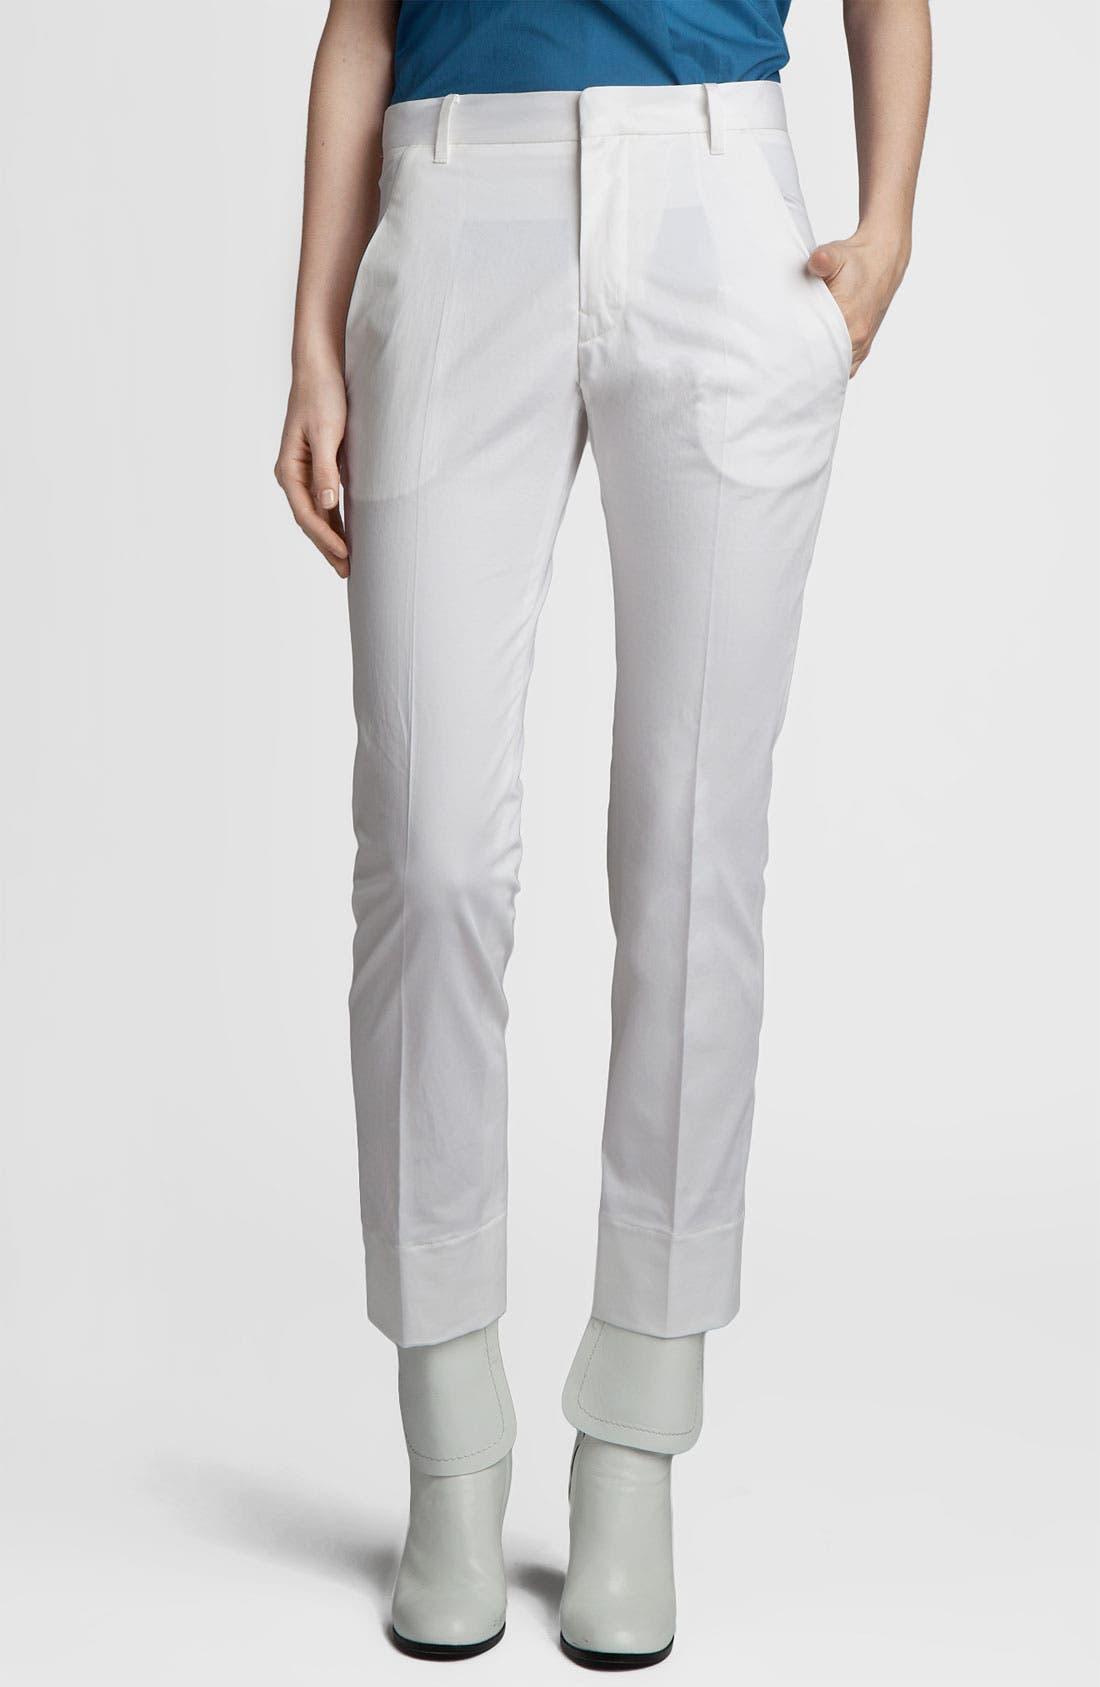 Alternate Image 1 Selected - Jil Sander 'Niccolo' Slim Stretch Cotton Pants